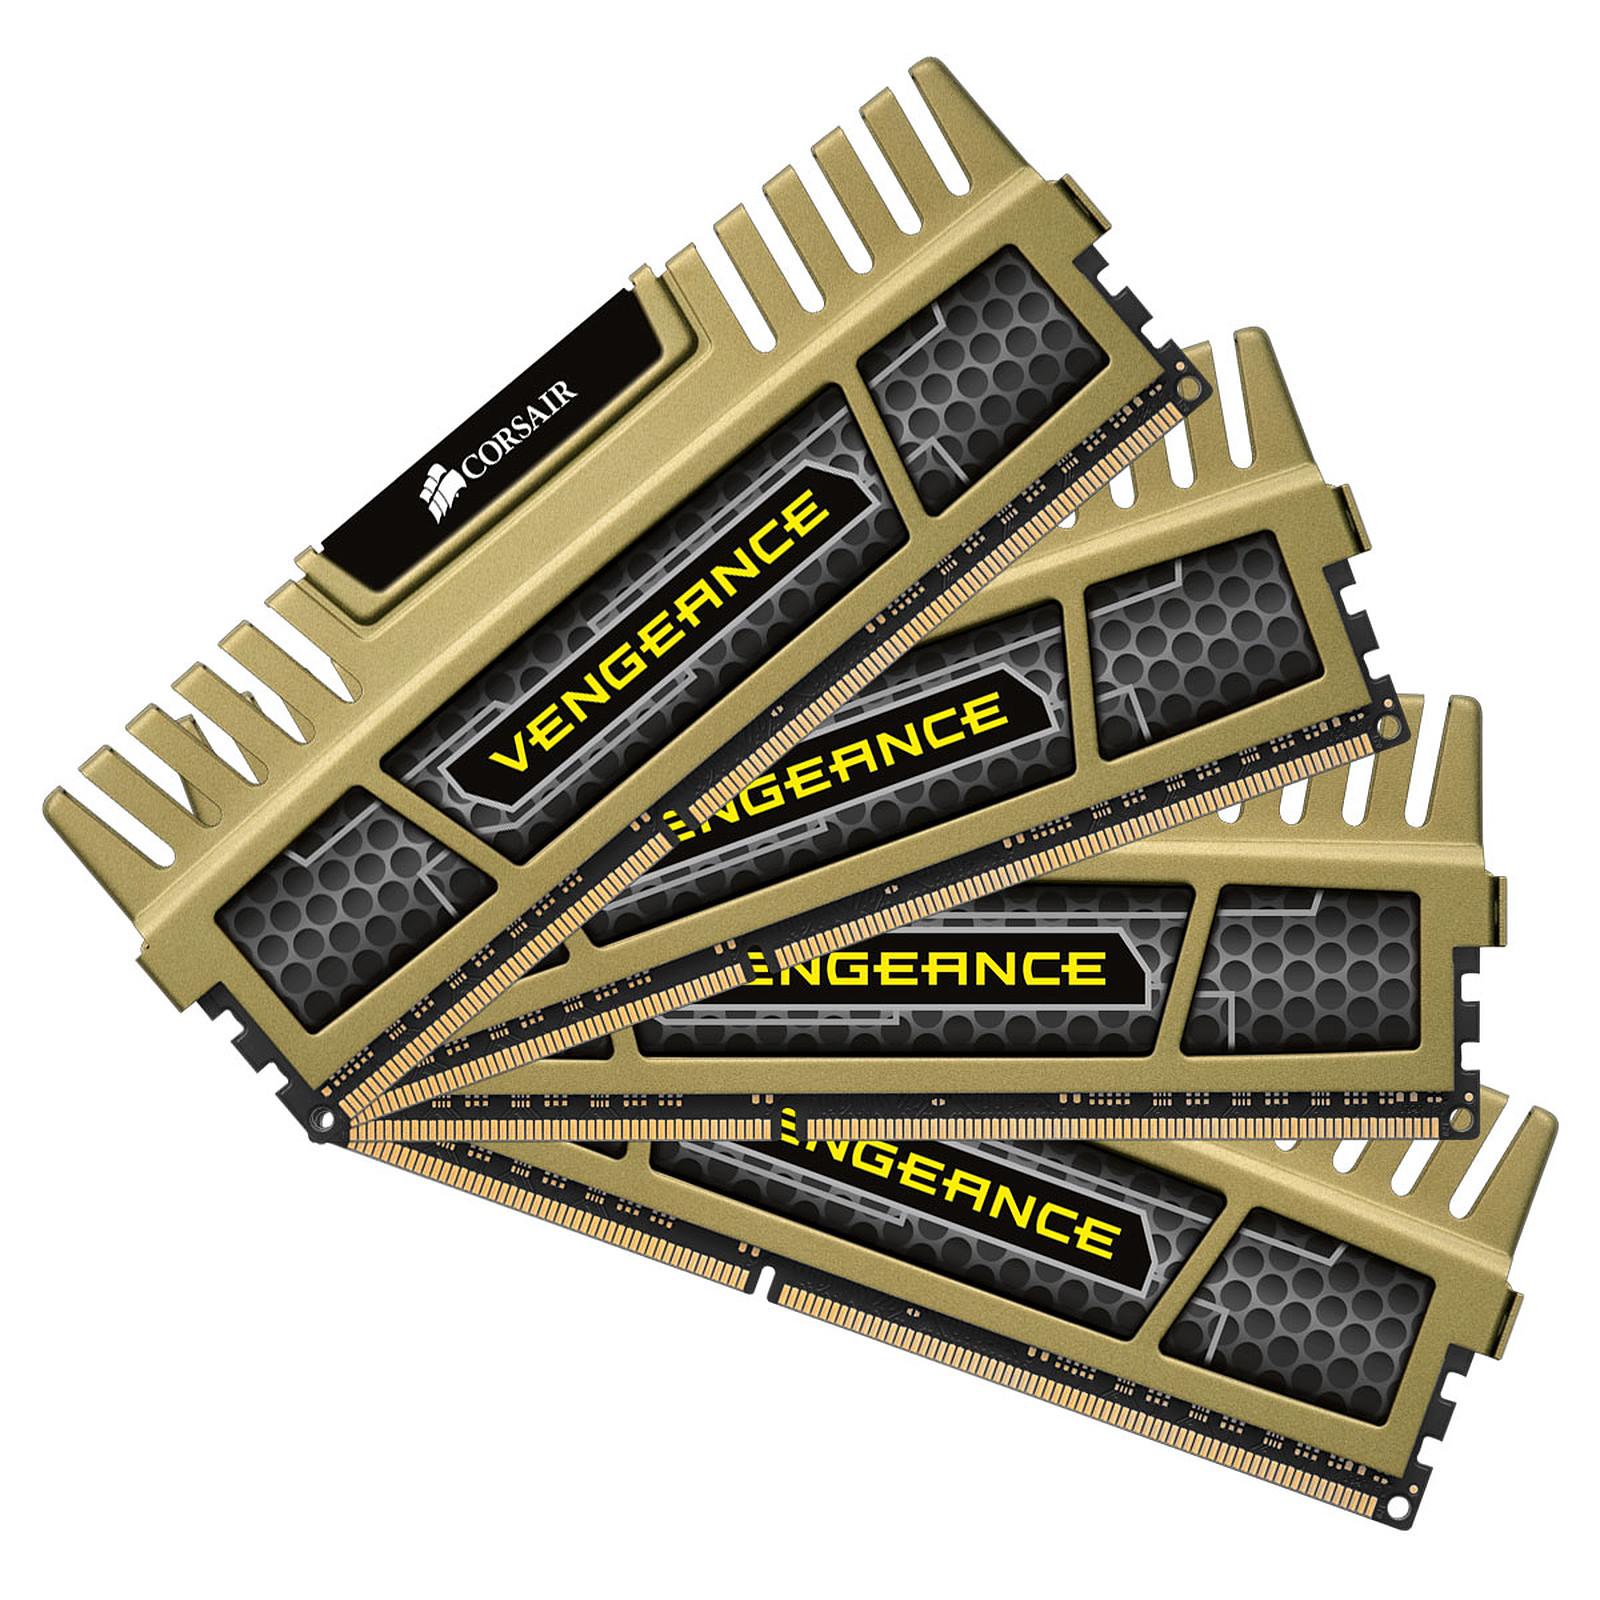 Corsair Vengeance Series 8 Go (4 x 2 Go) DDR3 1600 MHz CL9